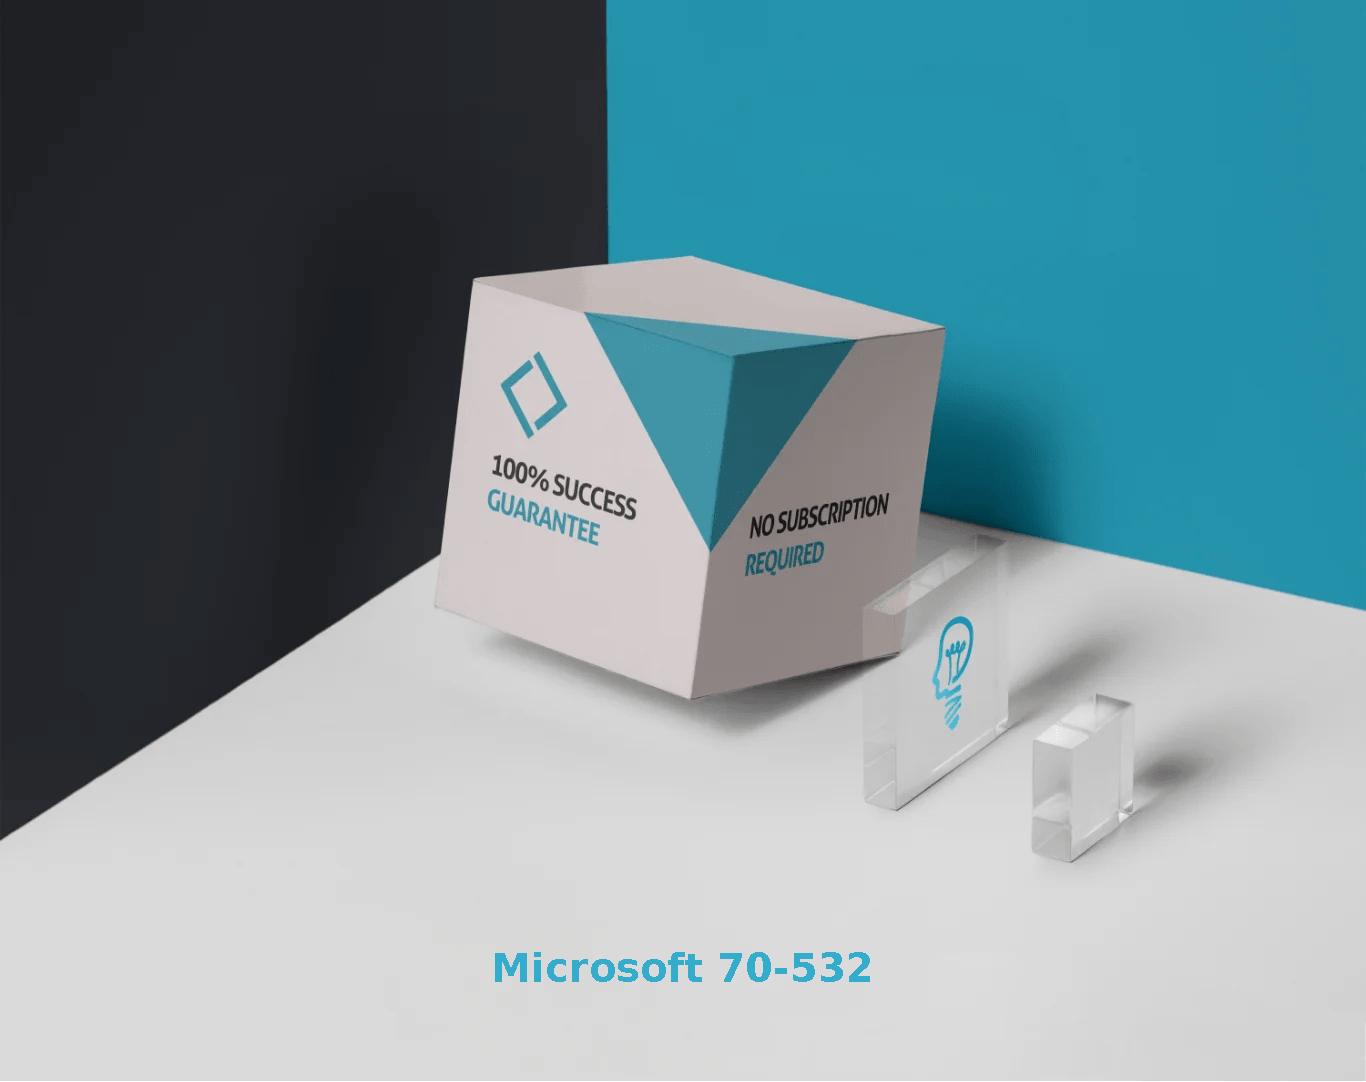 Microsoft 70-532 Exams